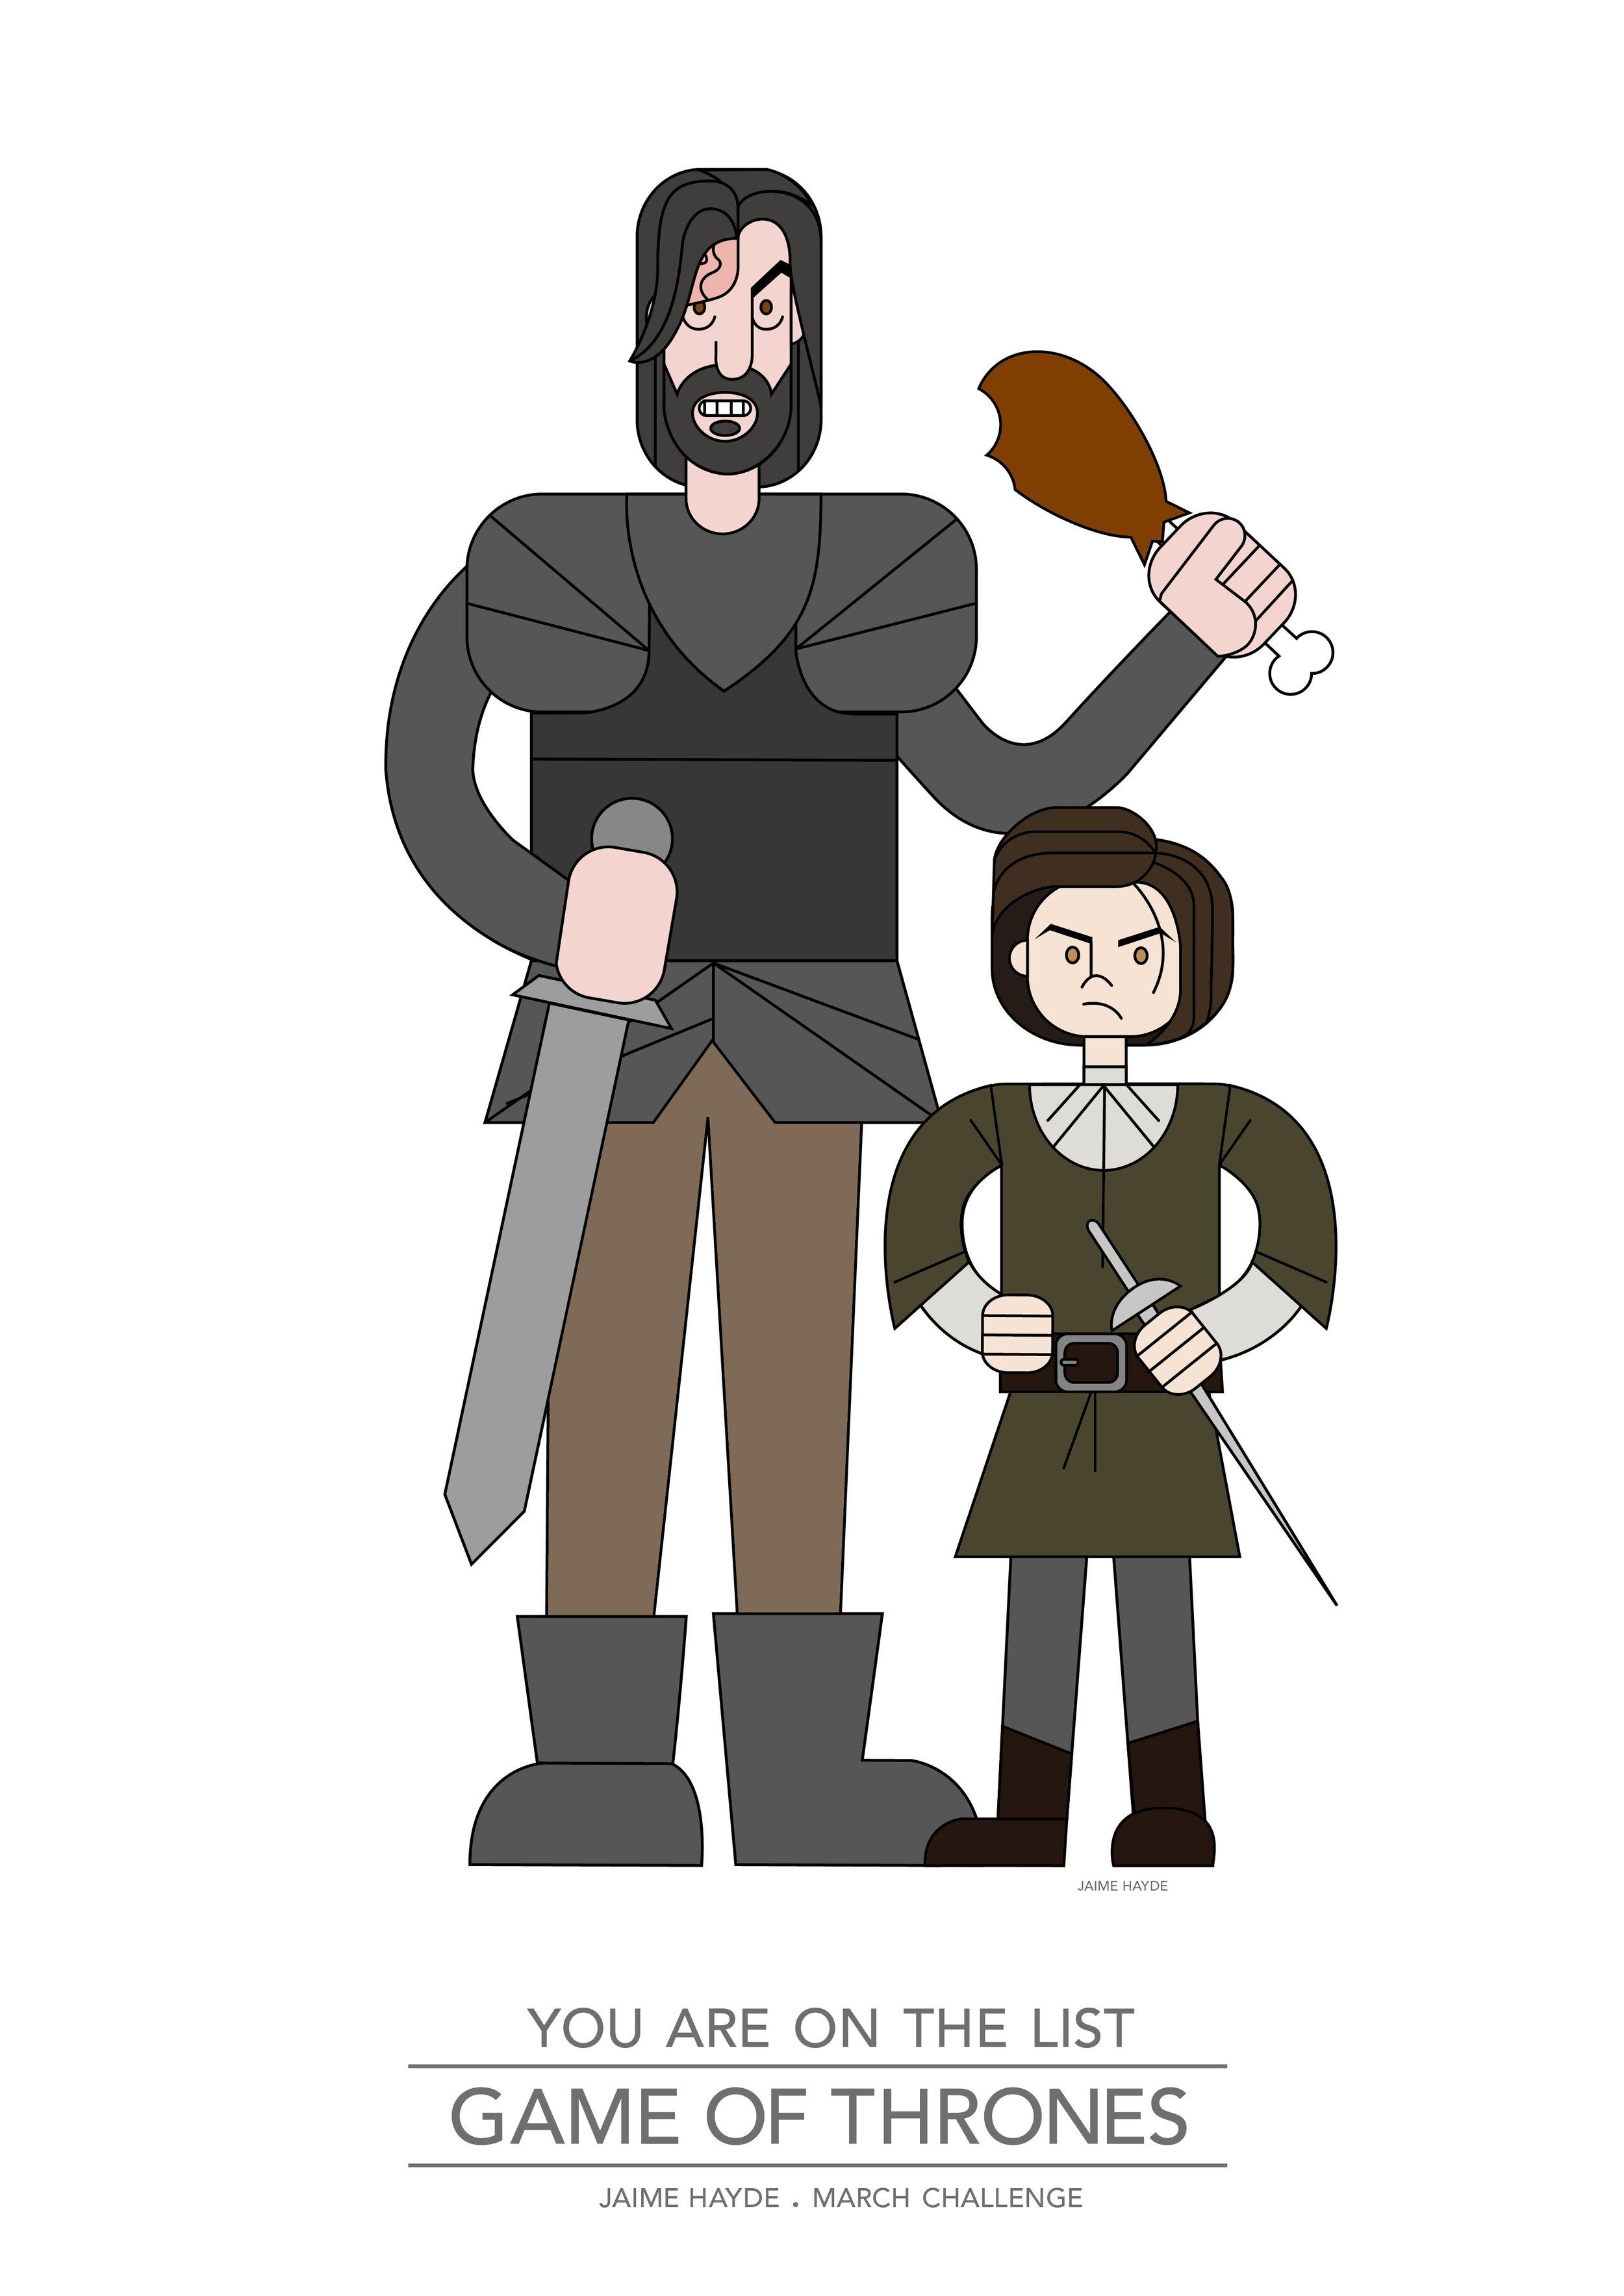 Game-of-thrones-Juego-de-tronos-illustration-poster-Arya stark.jpg